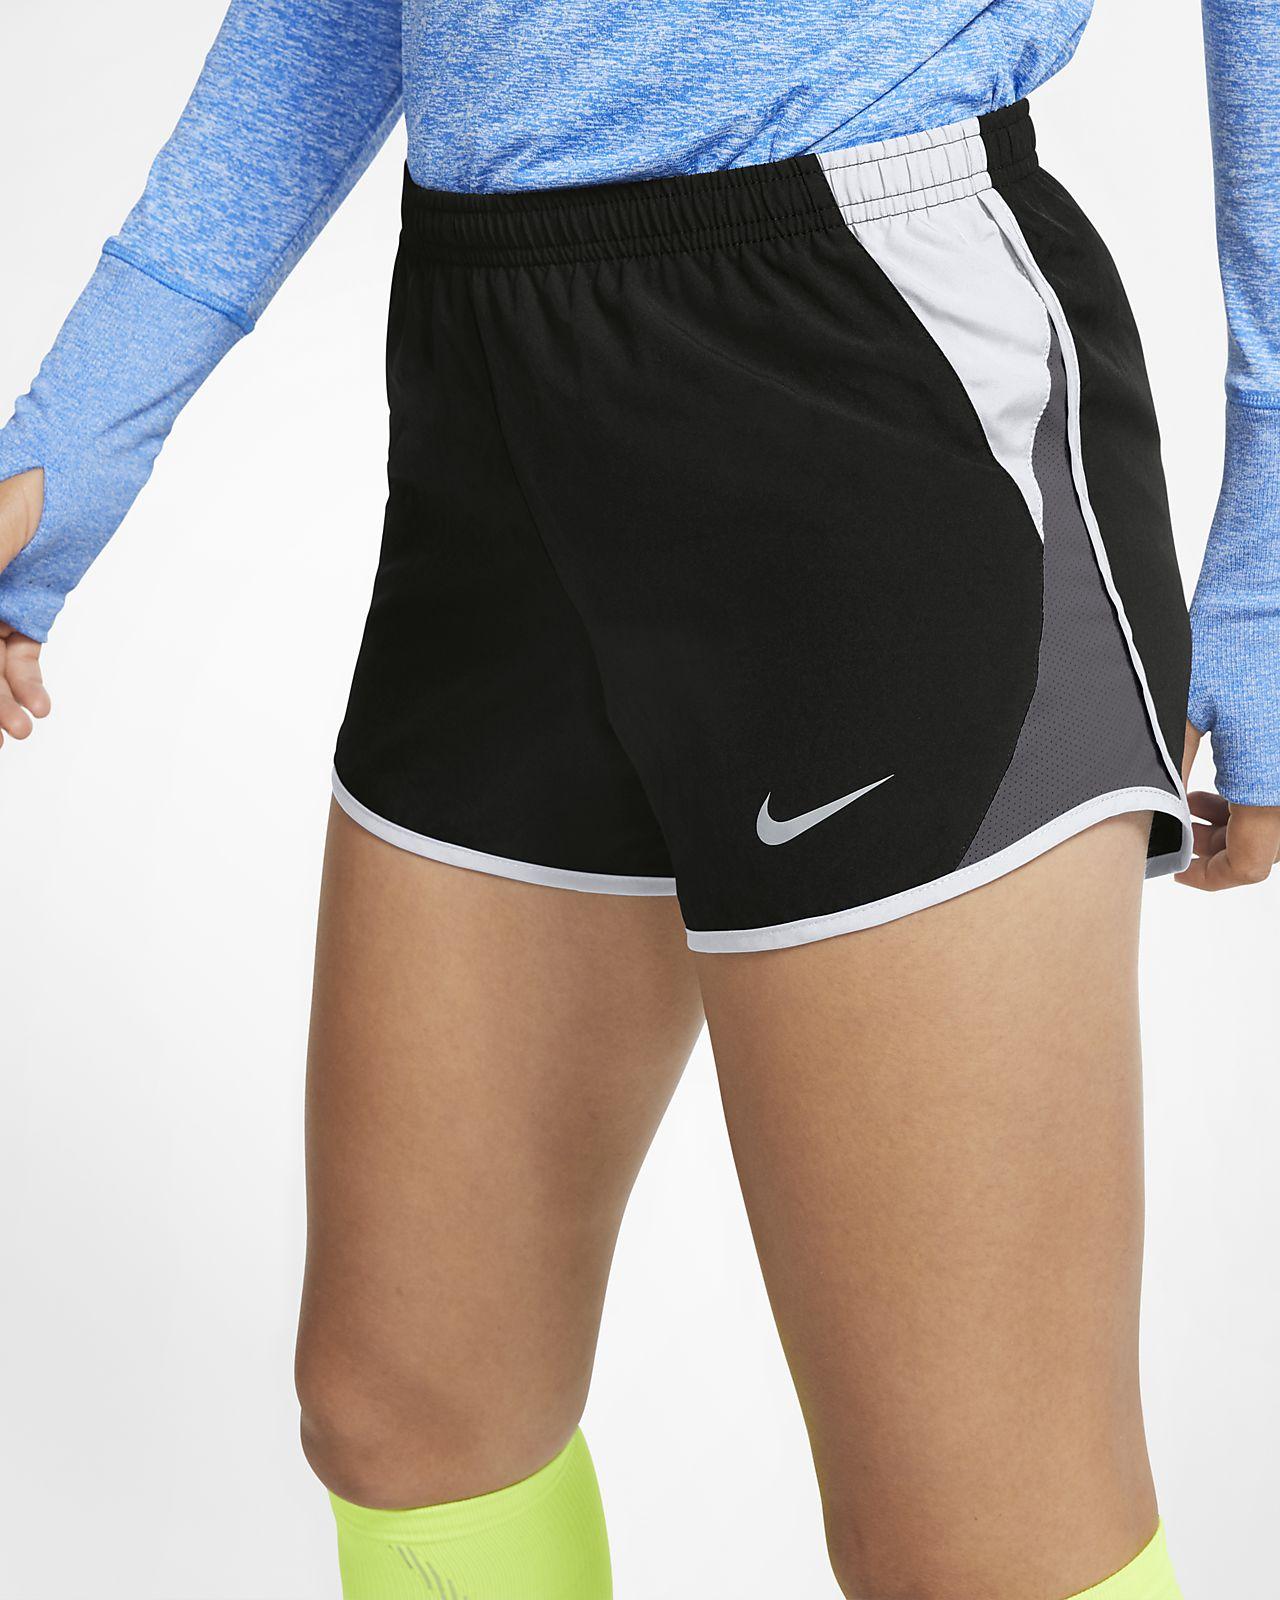 White Jeggings Cycling Shorts | Womens Cycling Shorts